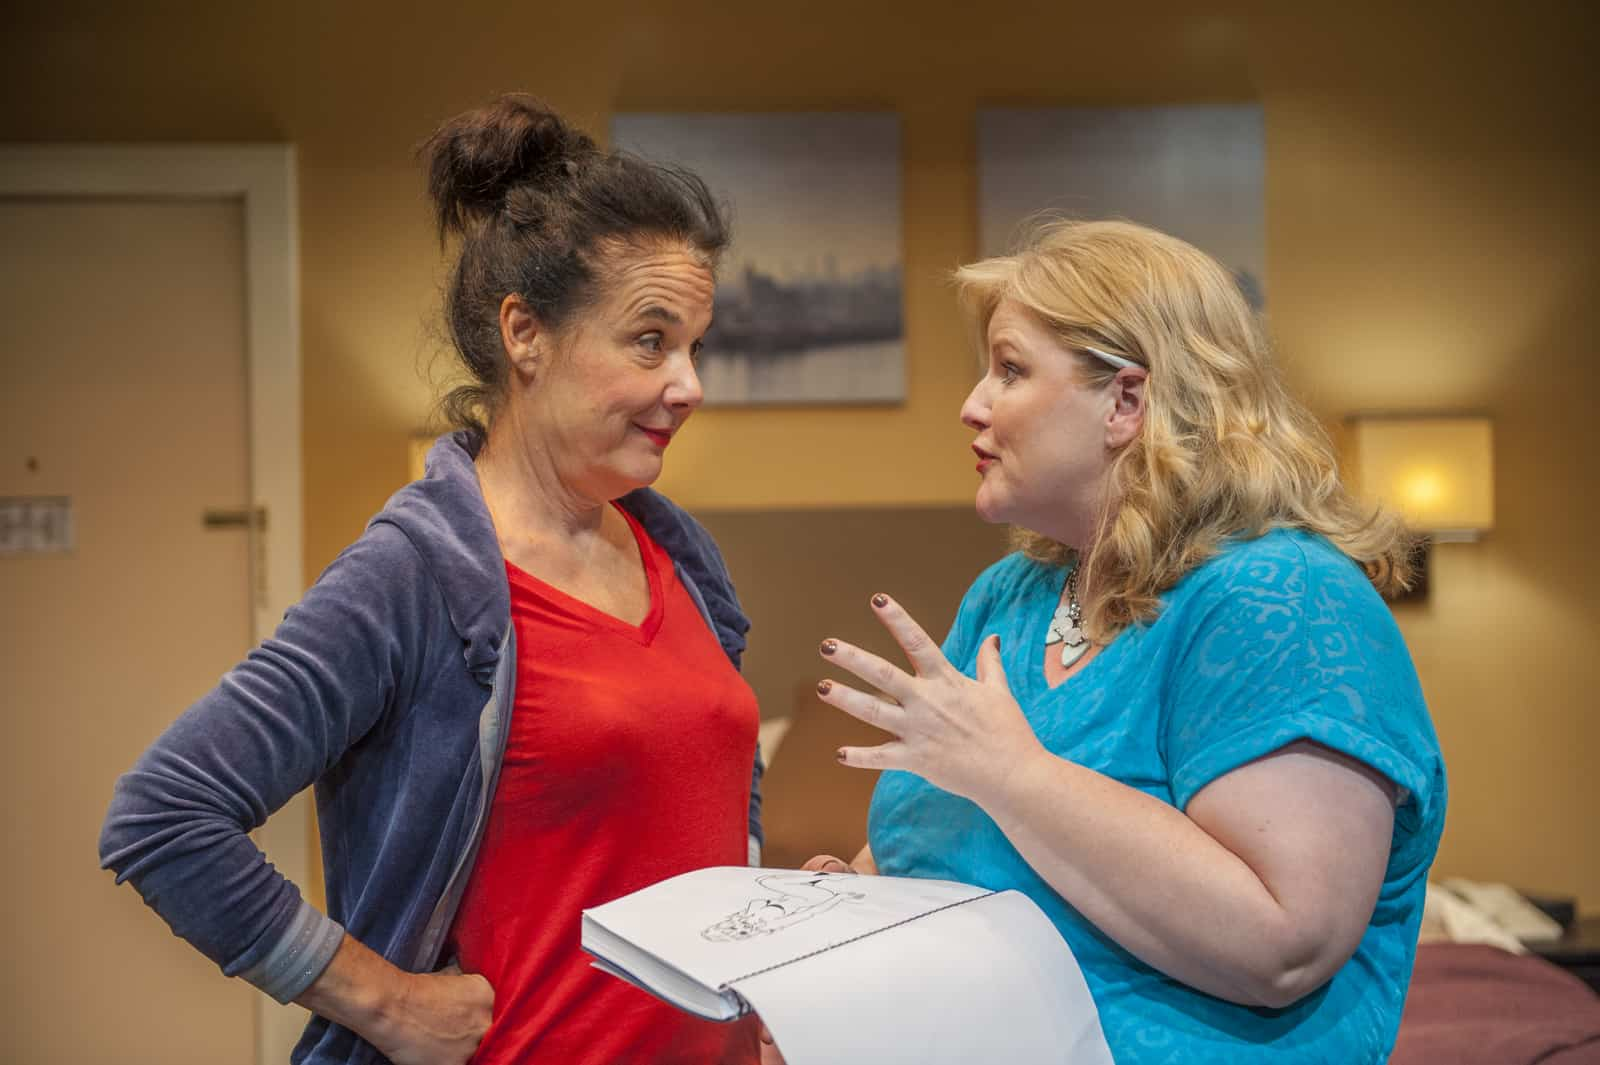 Mud Blue Sky - Aurora Theatre, Berkeley (Review)